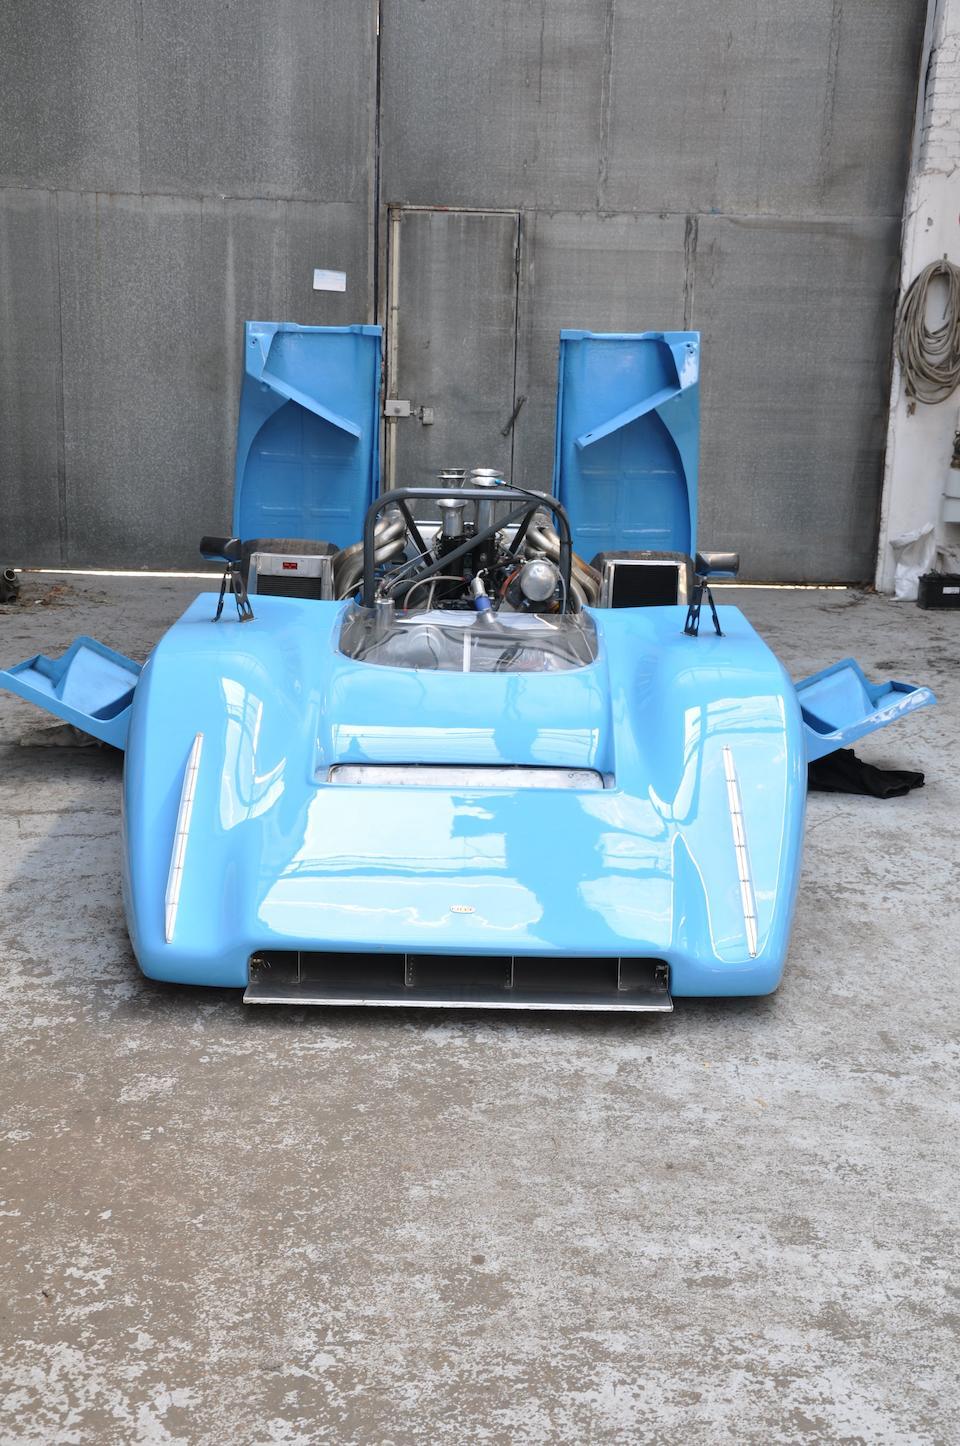 The Ex-Régis Fraissinet,1971-72 LOLA-CHEVROLET T222 CANAM RACING SPORTS SPYDER  Chassis no. HU3